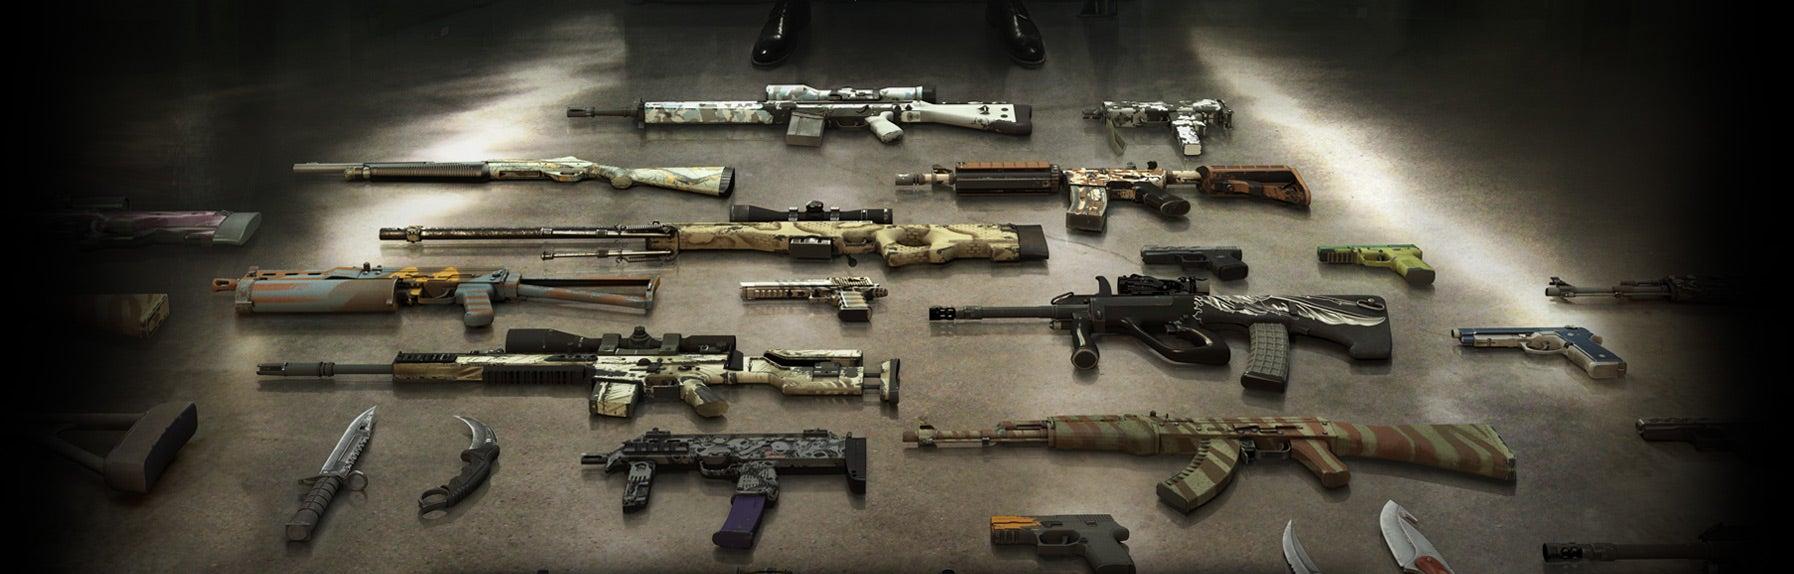 April Fools Joke Messes Up Counter-Strike's Marketplace